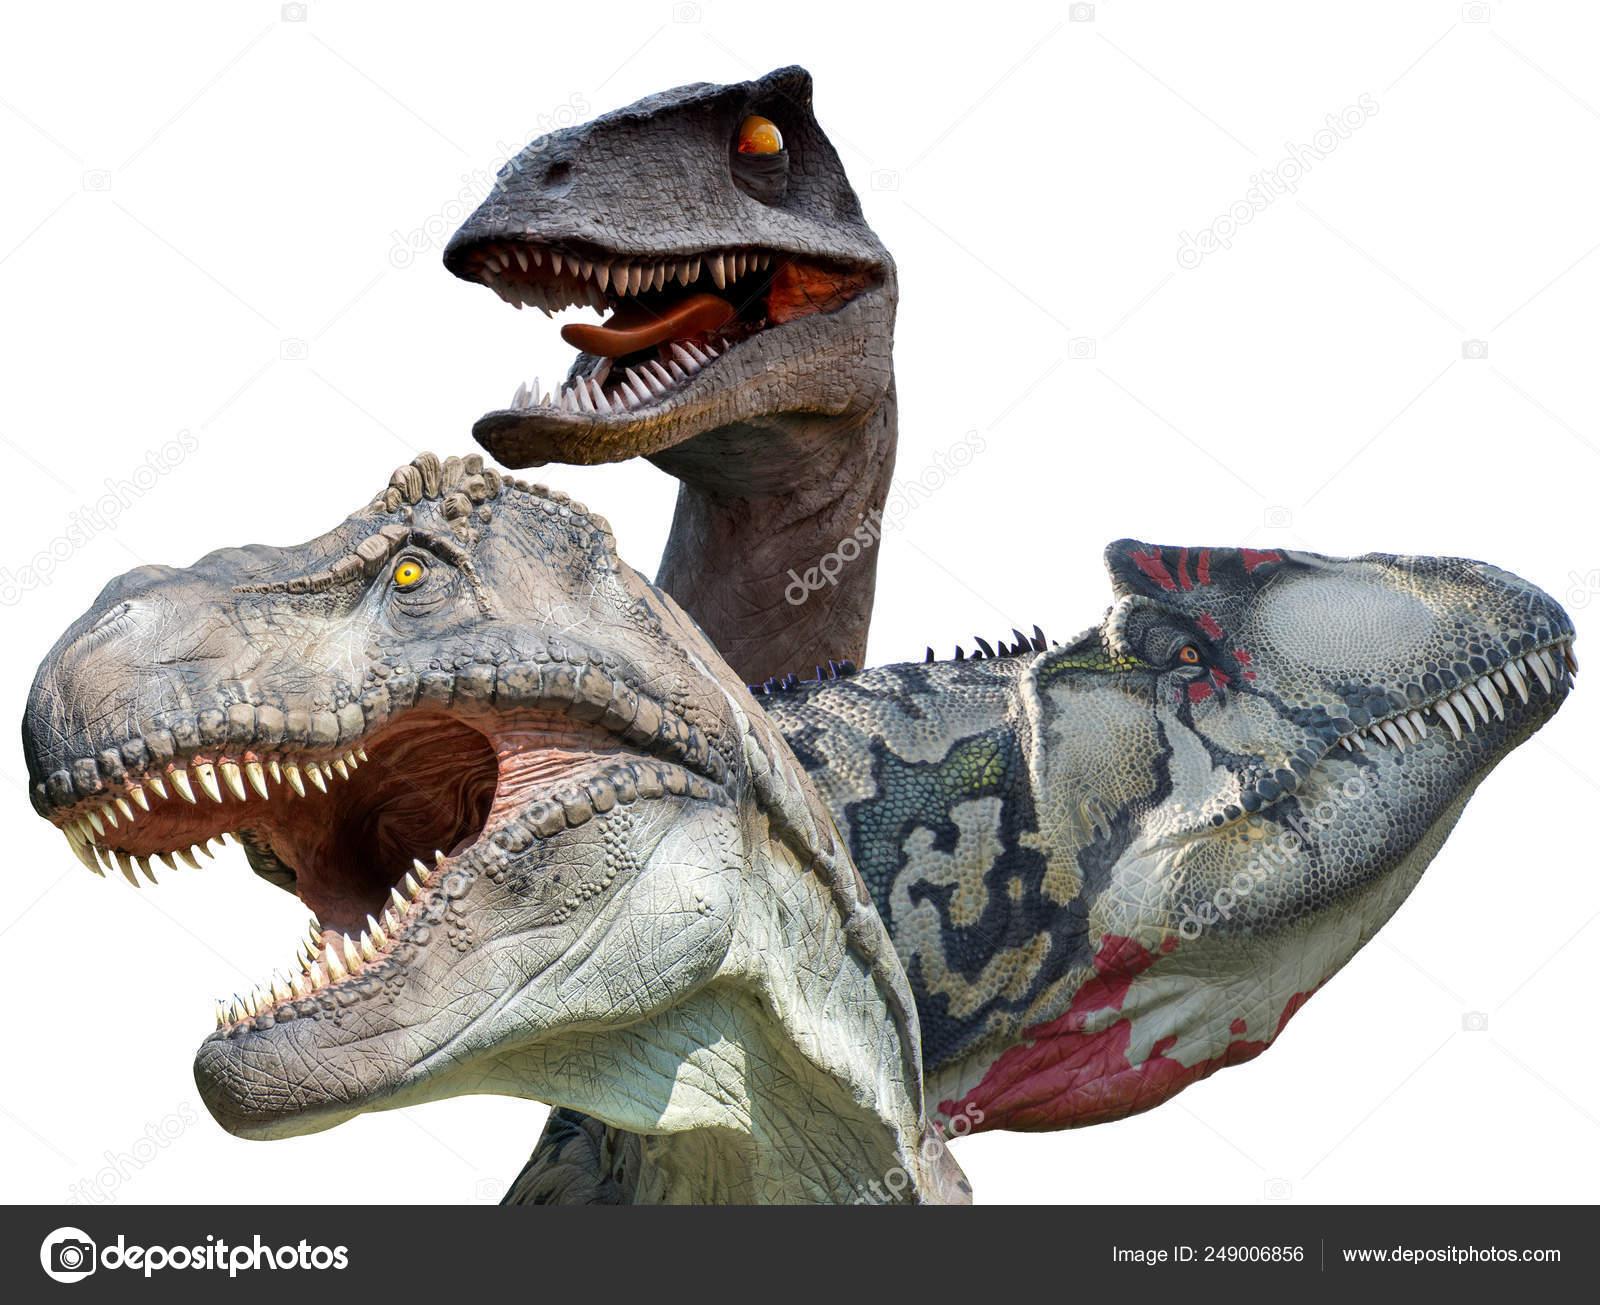 Carnivorous Dinosaurs Isolated White Background Tyrannosaurus Rex Allosaurus Velociraptor Stock Photo C Supercic 249006856 ✓ gratis para uso comercial ✓ imágenes de gran calidad. carnivorous dinosaurs isolated white background tyrannosaurus rex allosaurus velociraptor stock photo c supercic 249006856